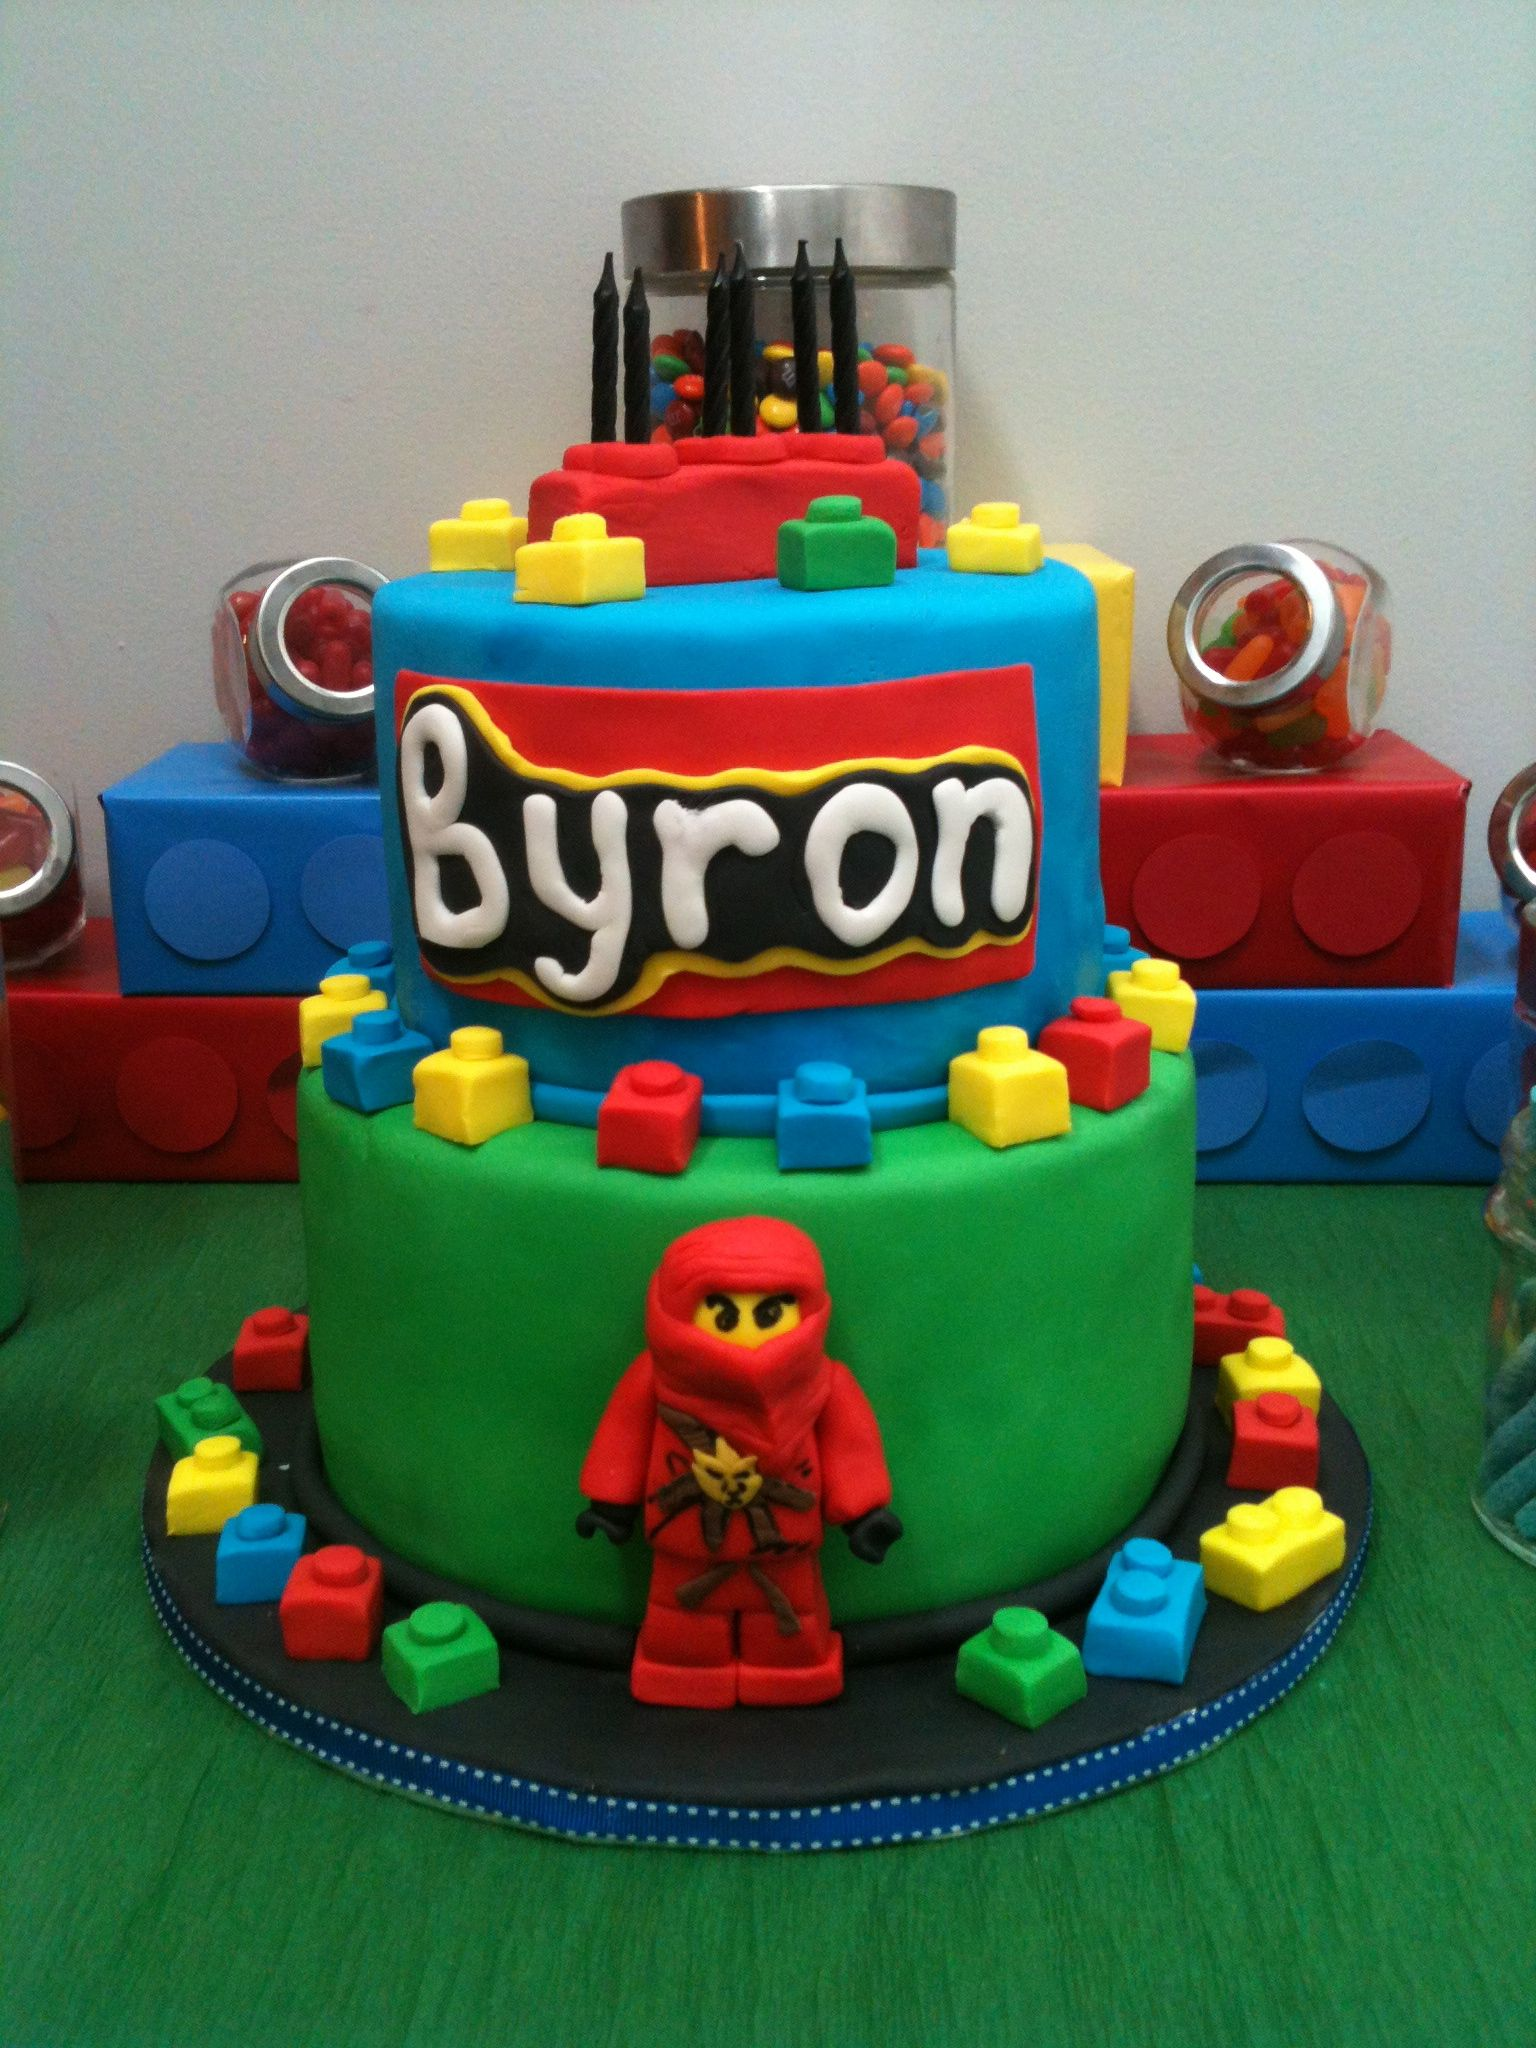 Lego Partynjago Cake Made By Sugar Shake Cakes Calgary